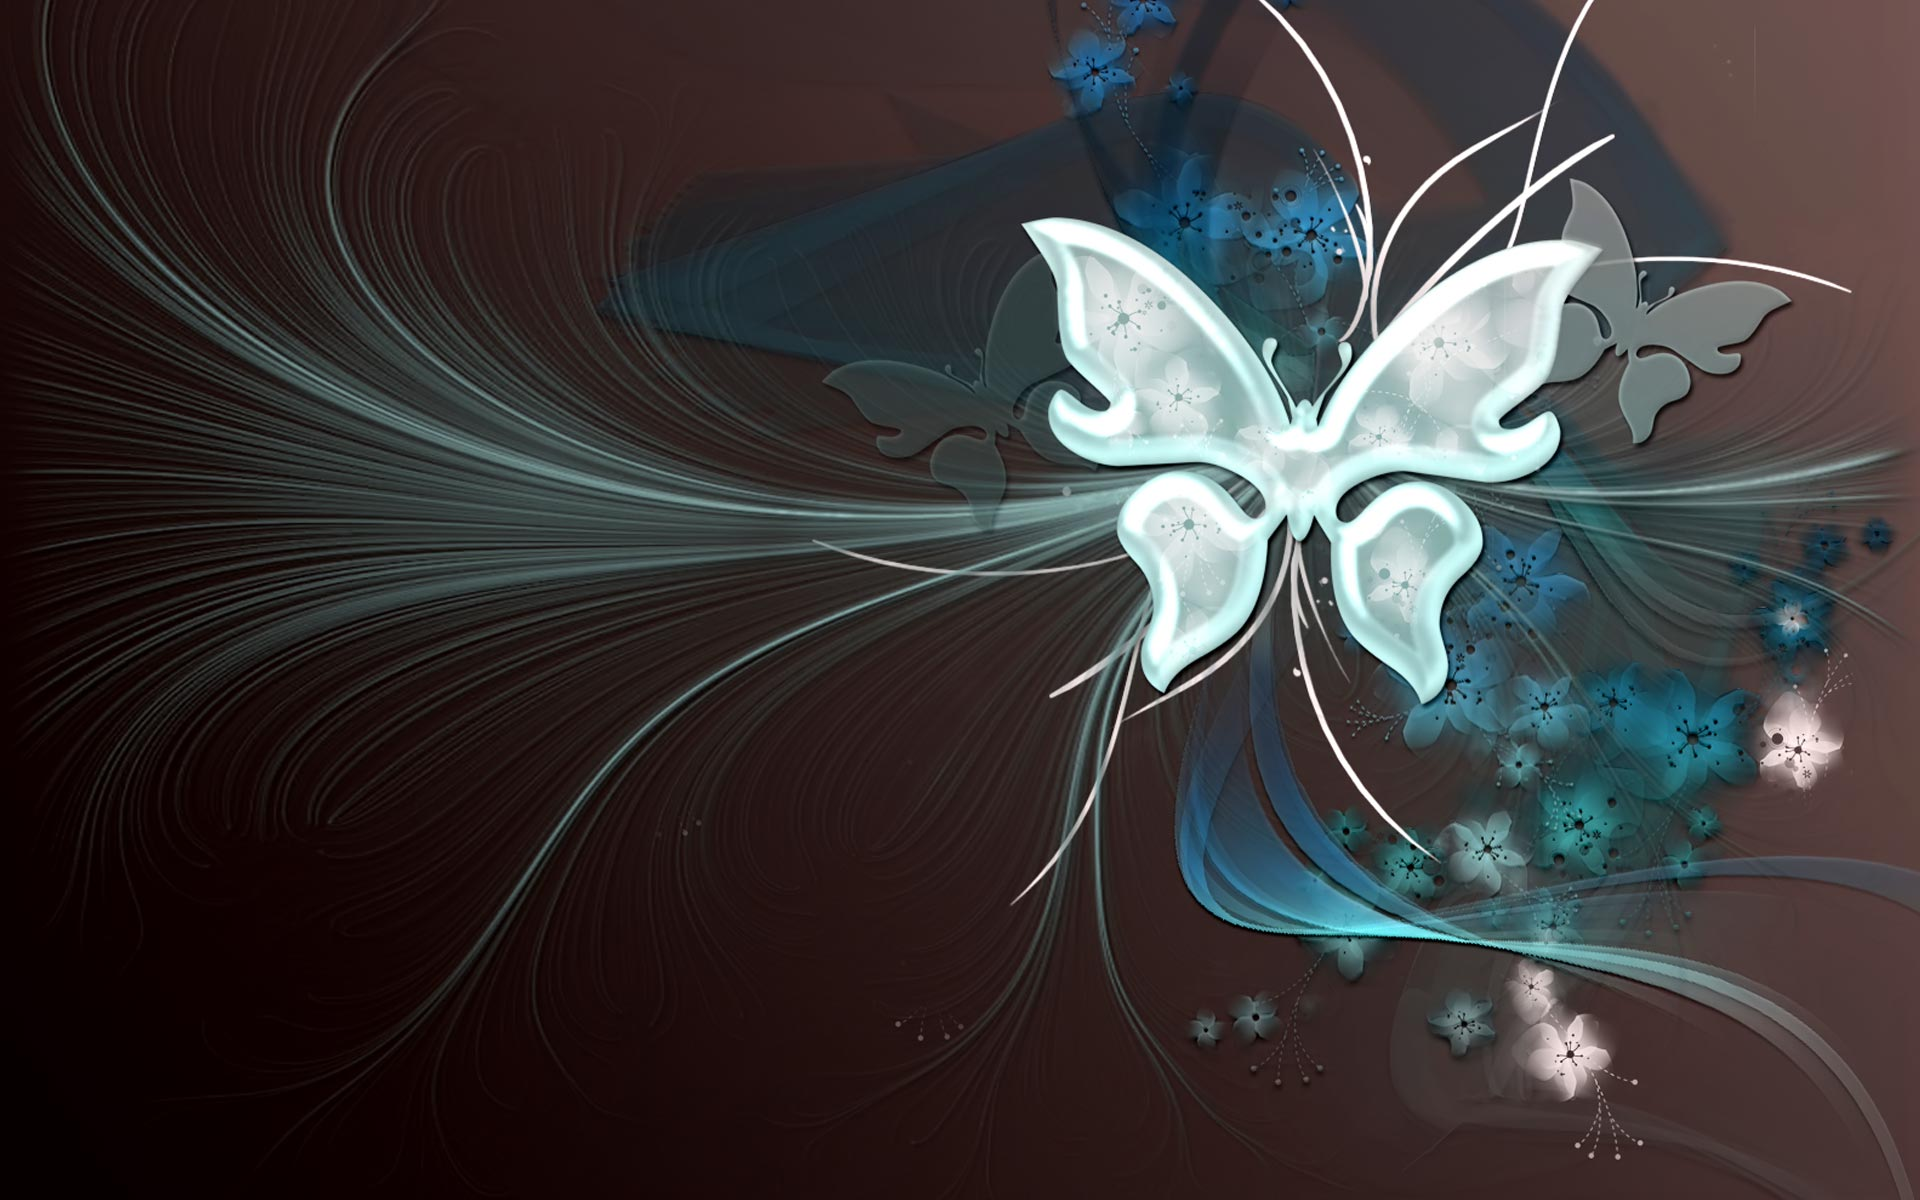 wallpaper desktop vector butterfly wallpapers backgrounds 1920x1200 1920x1200